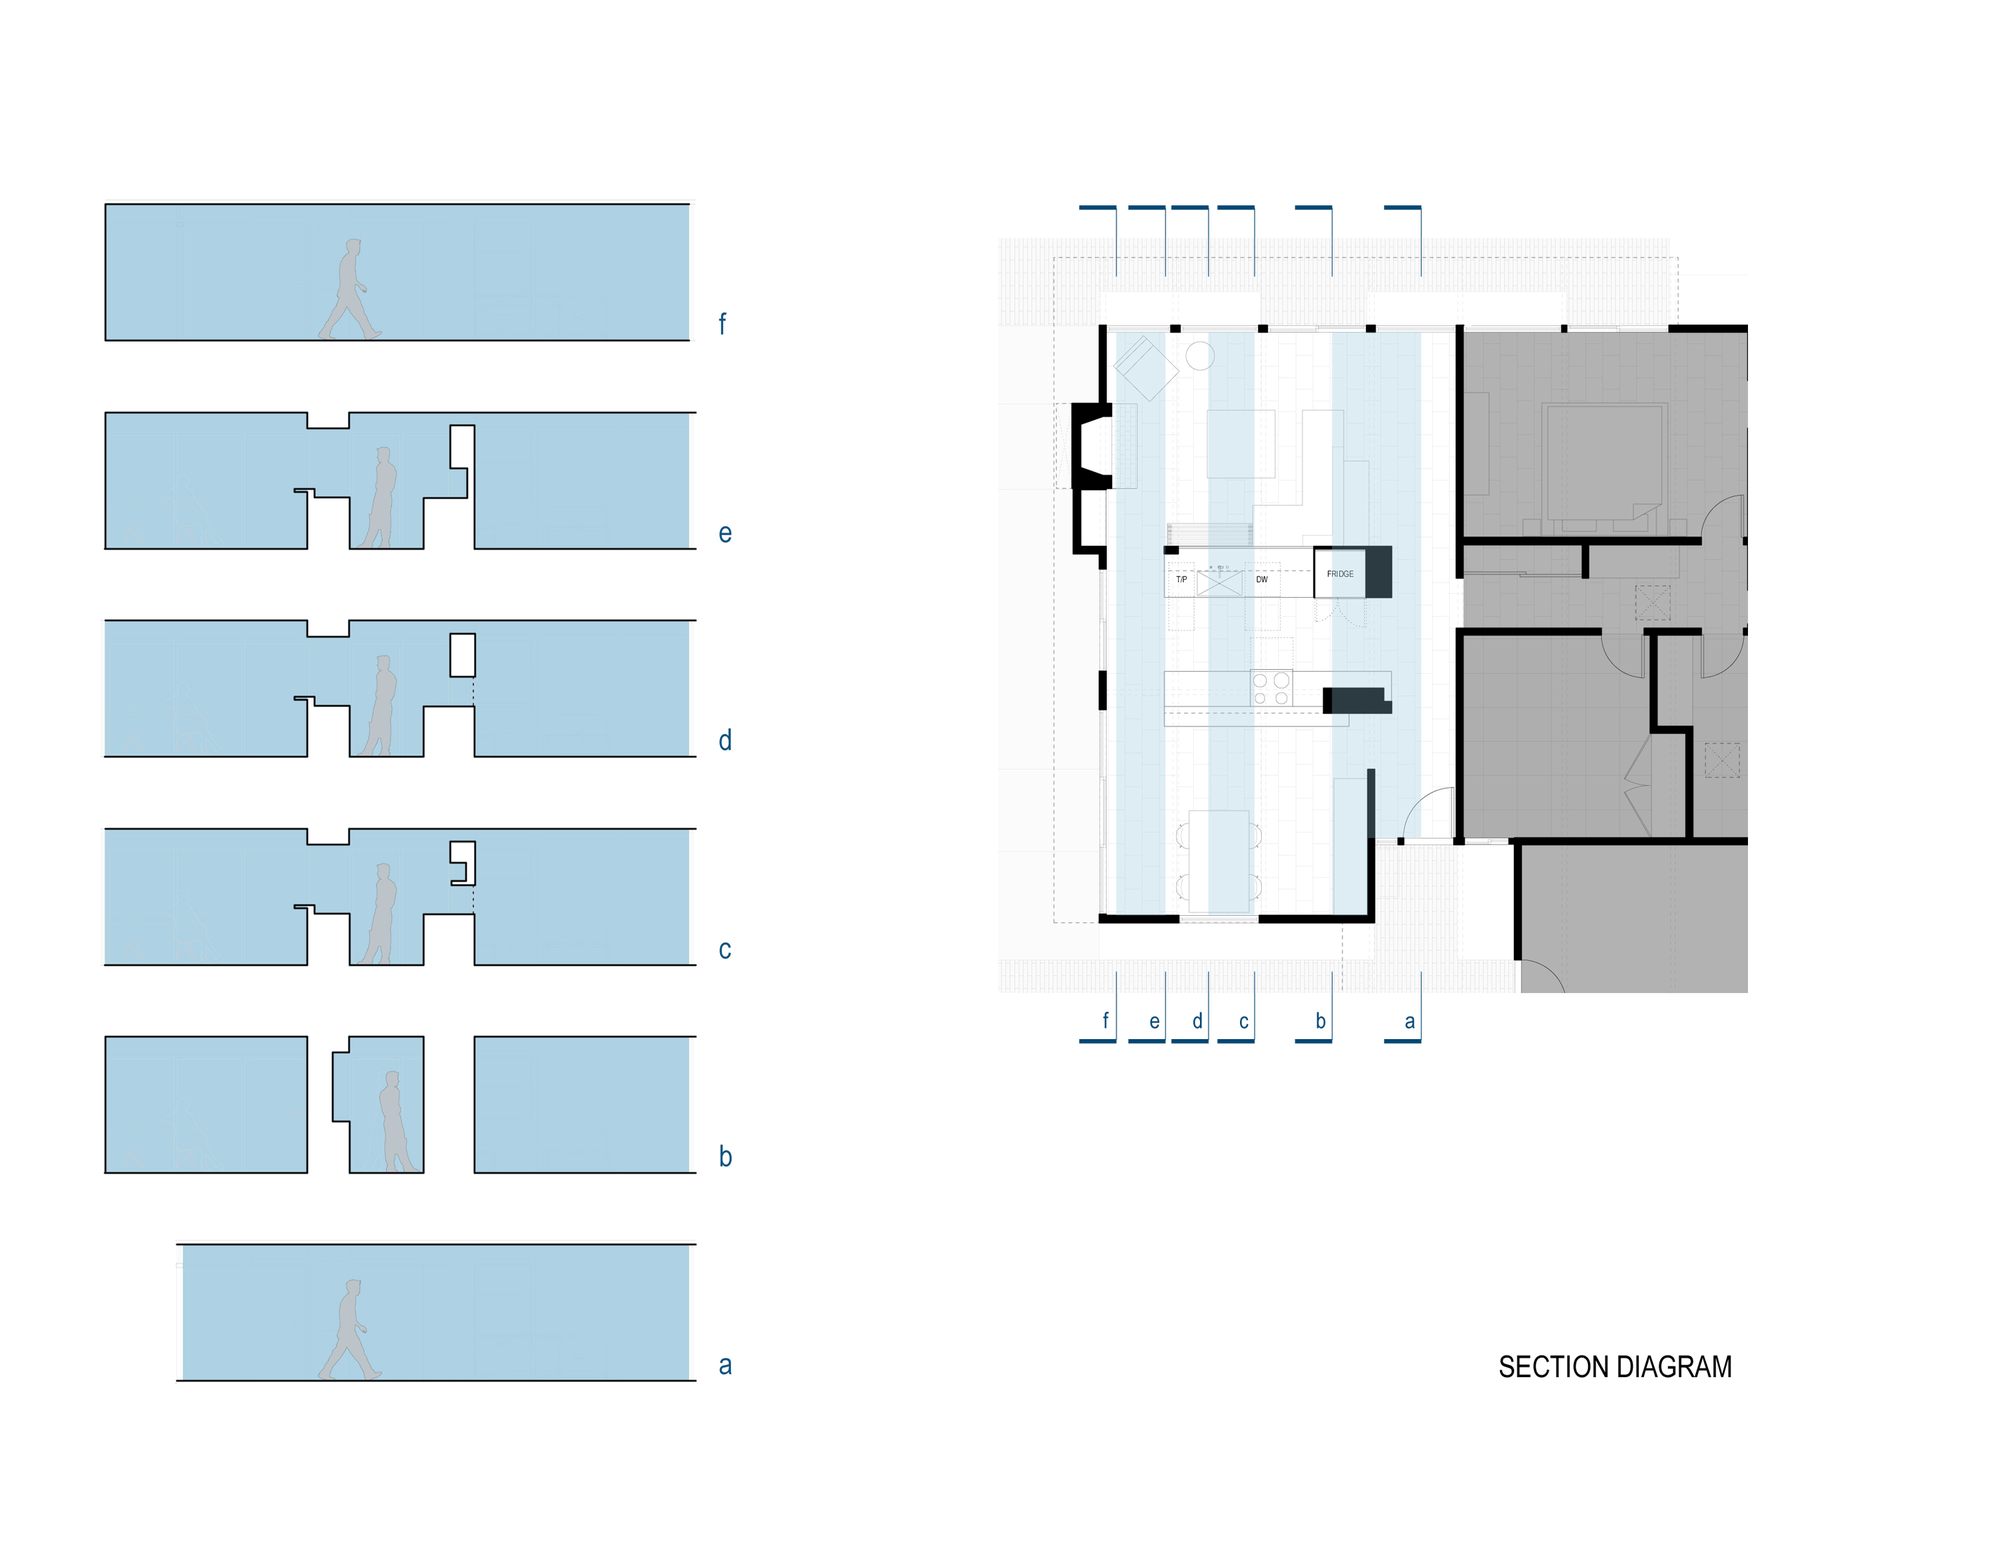 5306c8b3c07a80c45f0000d4_shoup-residence-buildin-lab_shoup_bl_diagram_3